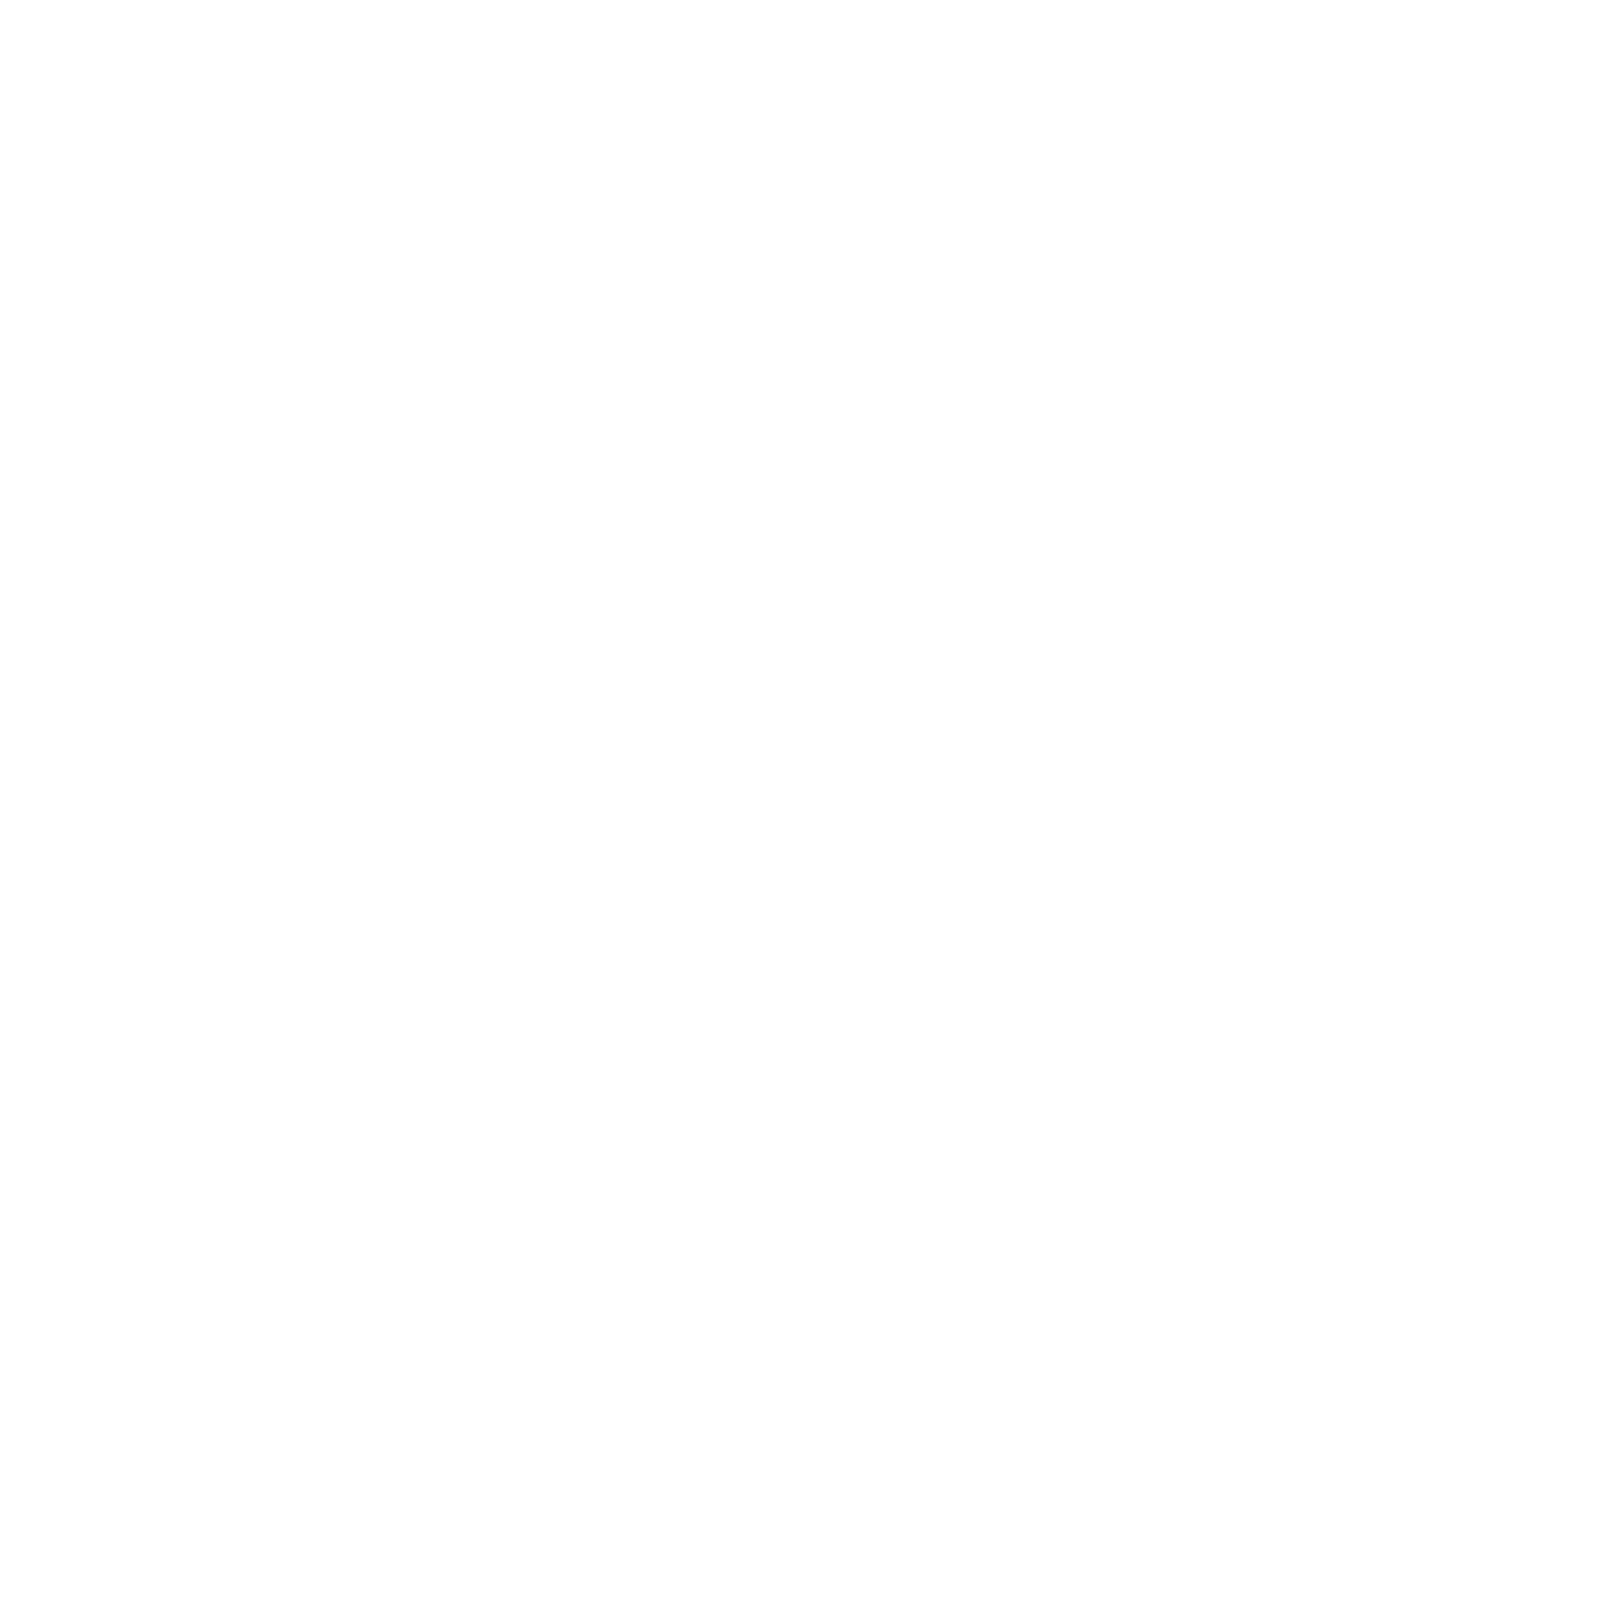 rentokil-project-logo